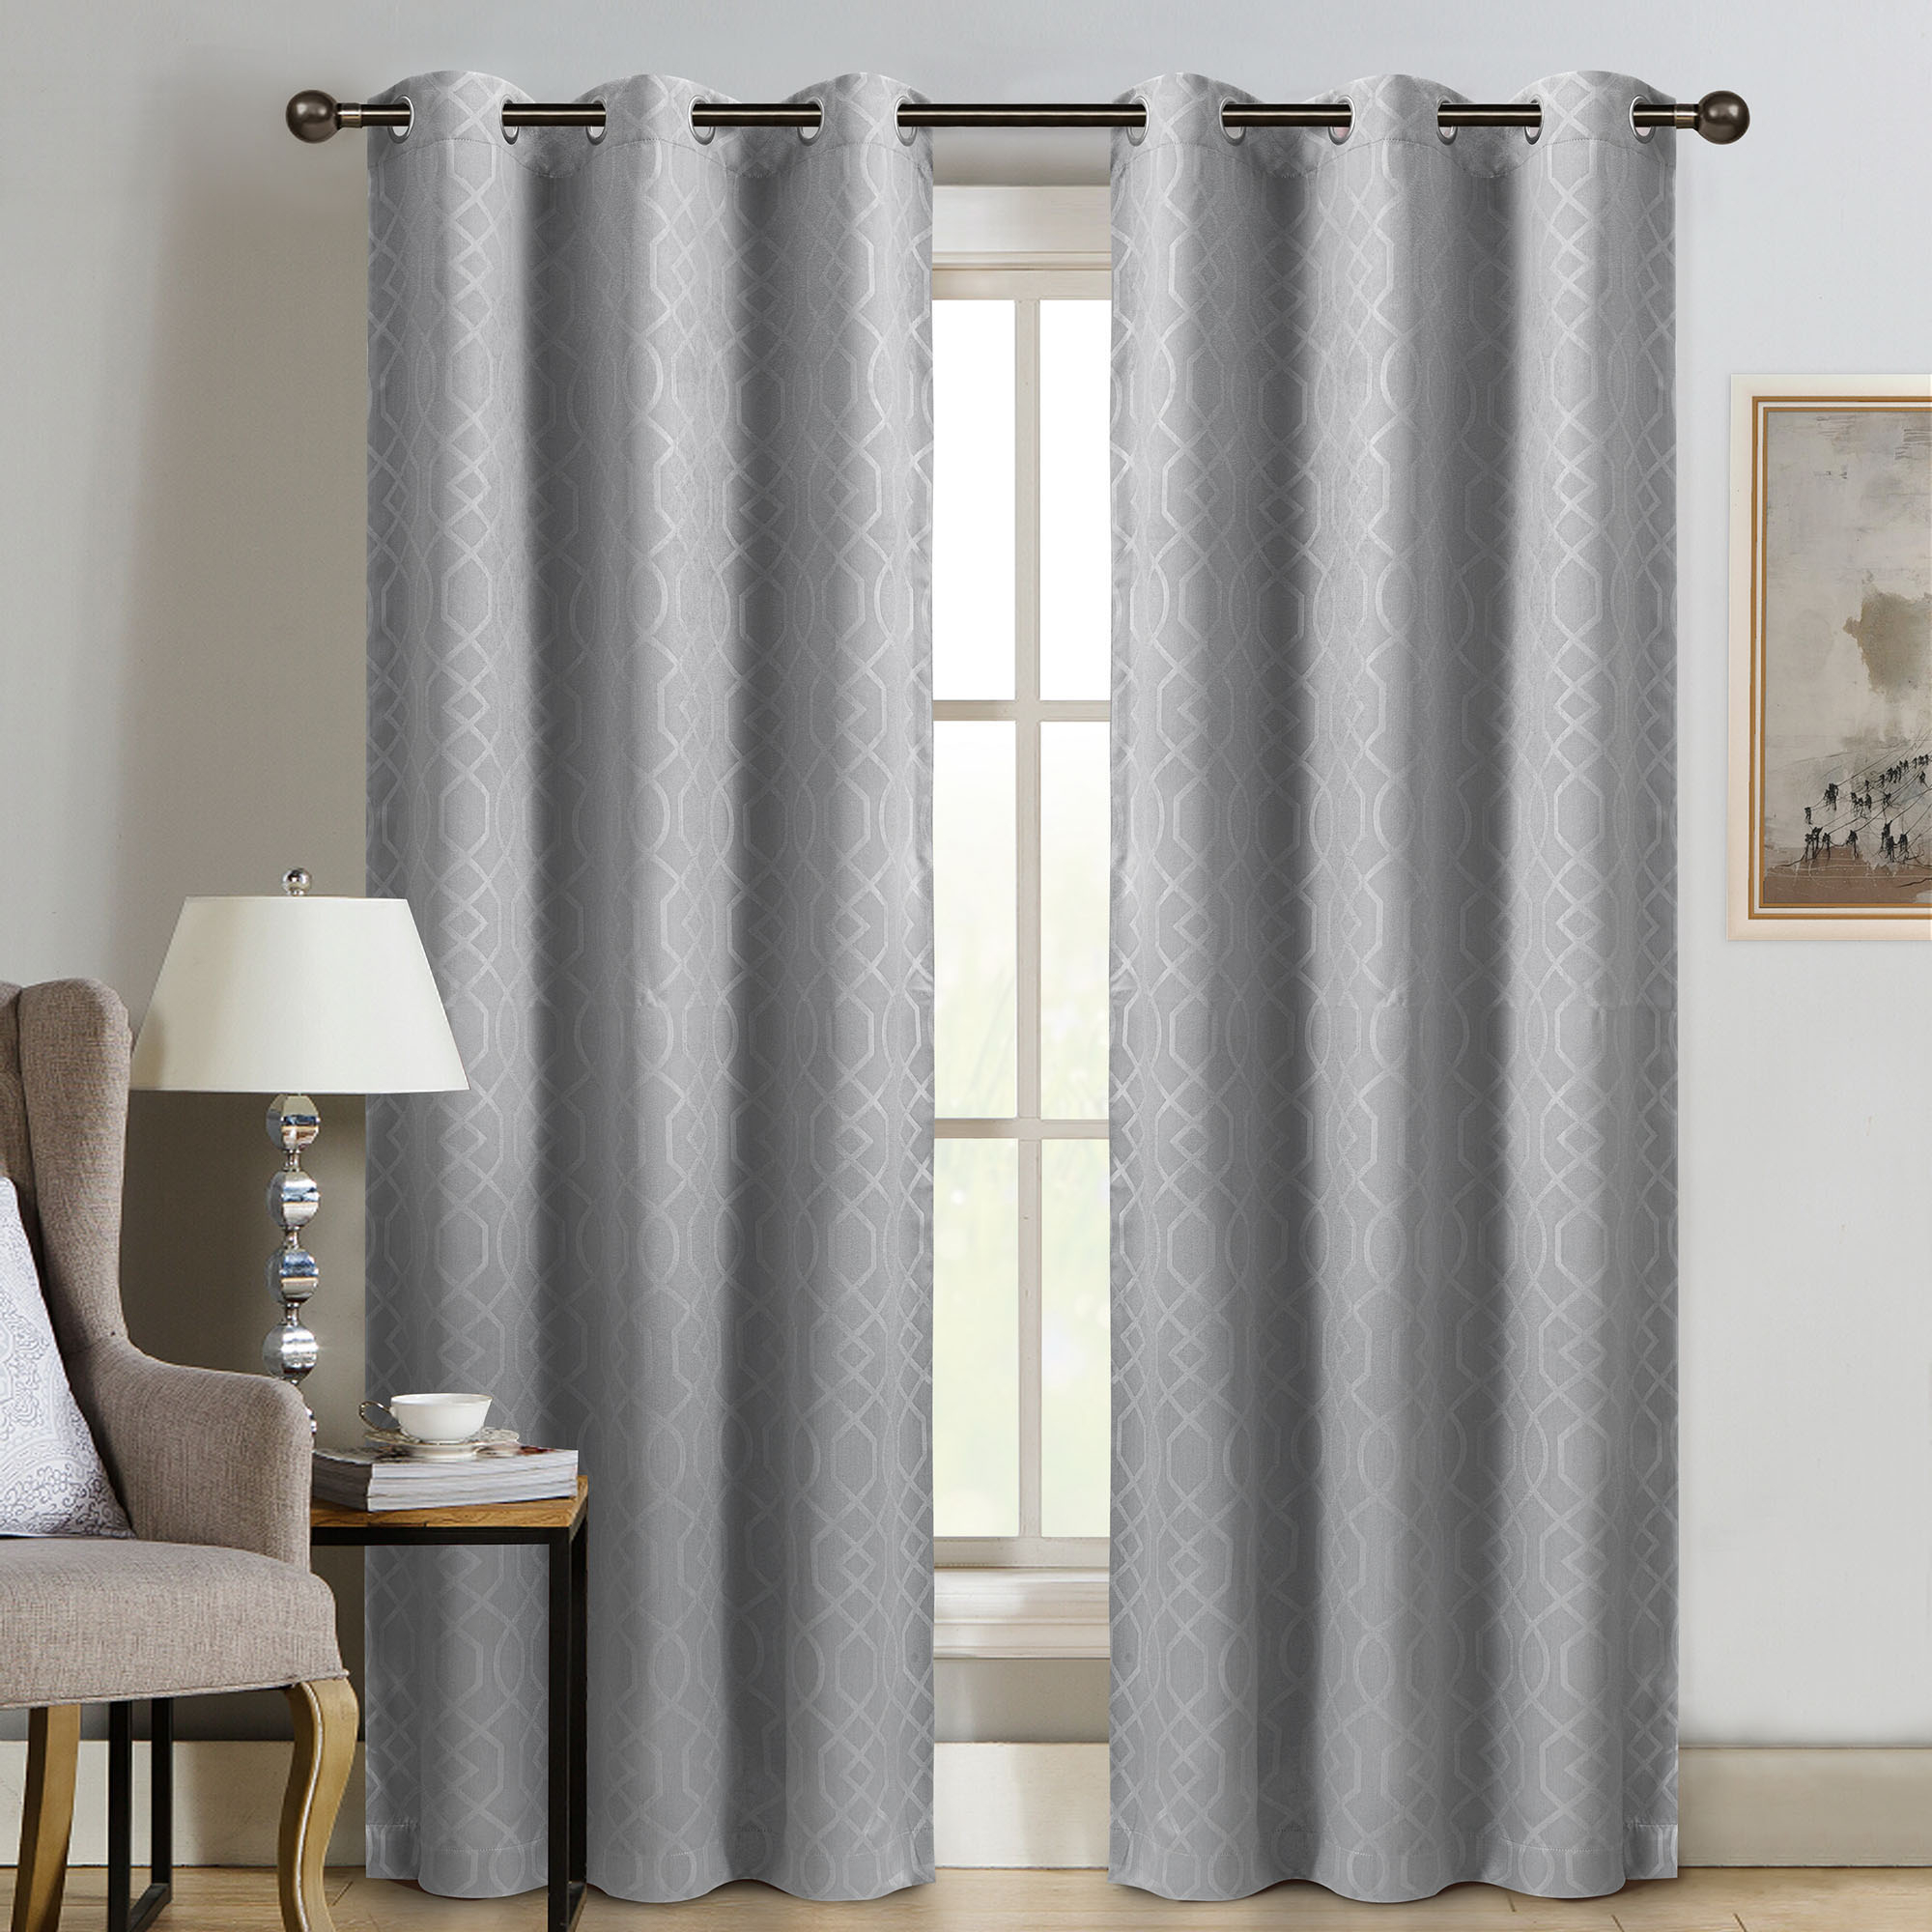 "Sun+block Thermal Weave Embossed Blackout Grommet Single Curtain Panel 42""x84"" For Embossed Thermal Weaved Blackout Grommet Drapery Curtains (View 2 of 20)"